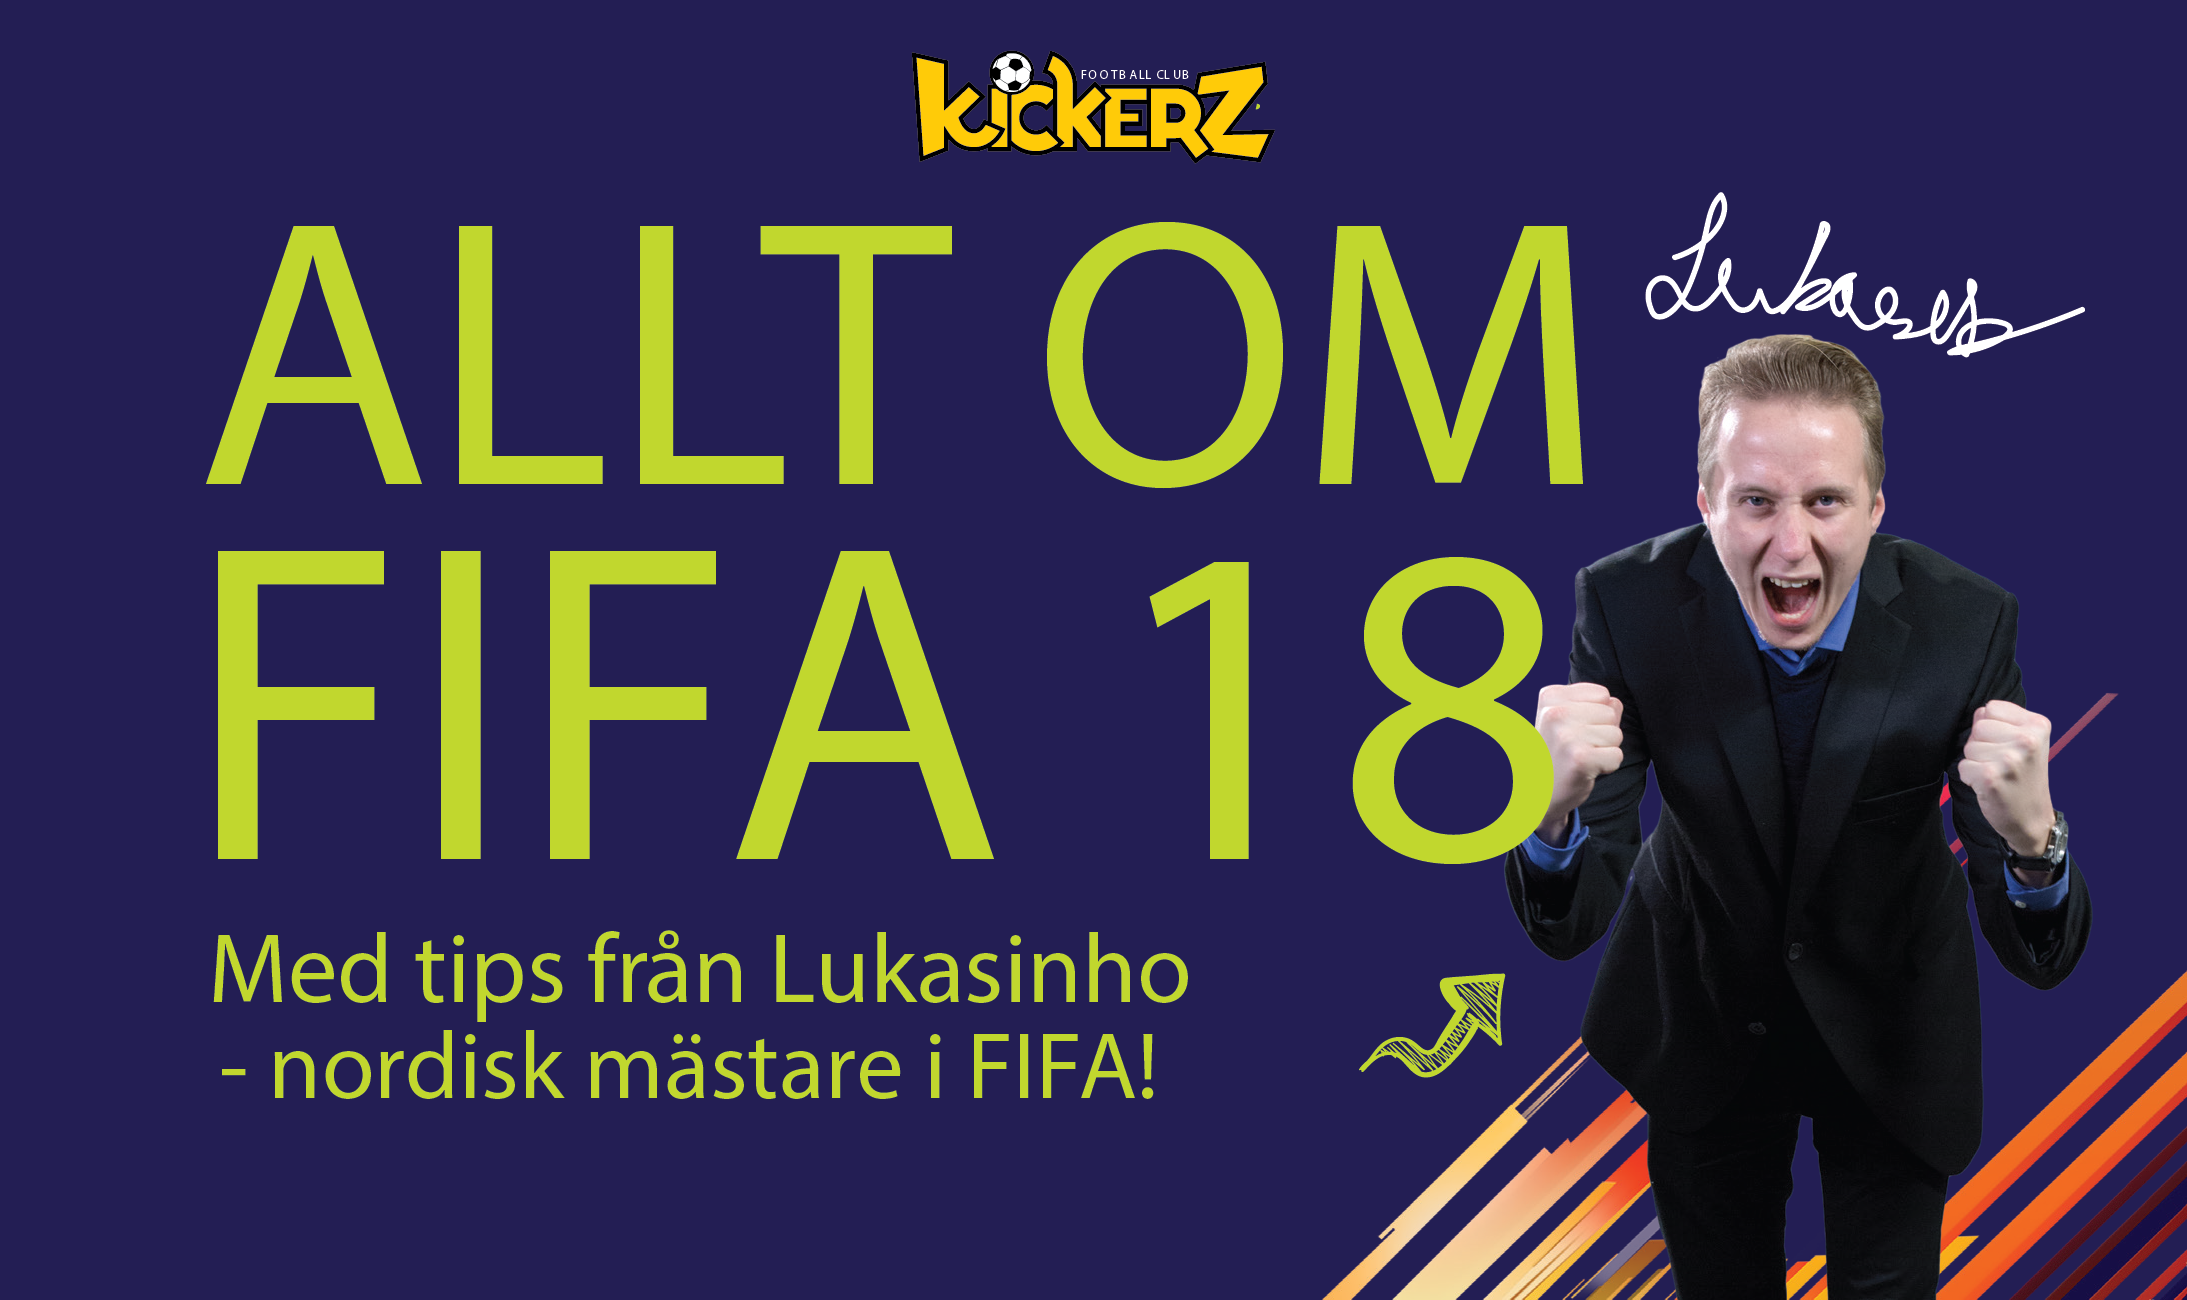 KICKERZ: FIFA18 SPECIAL EDITION With pro player Lukasinho